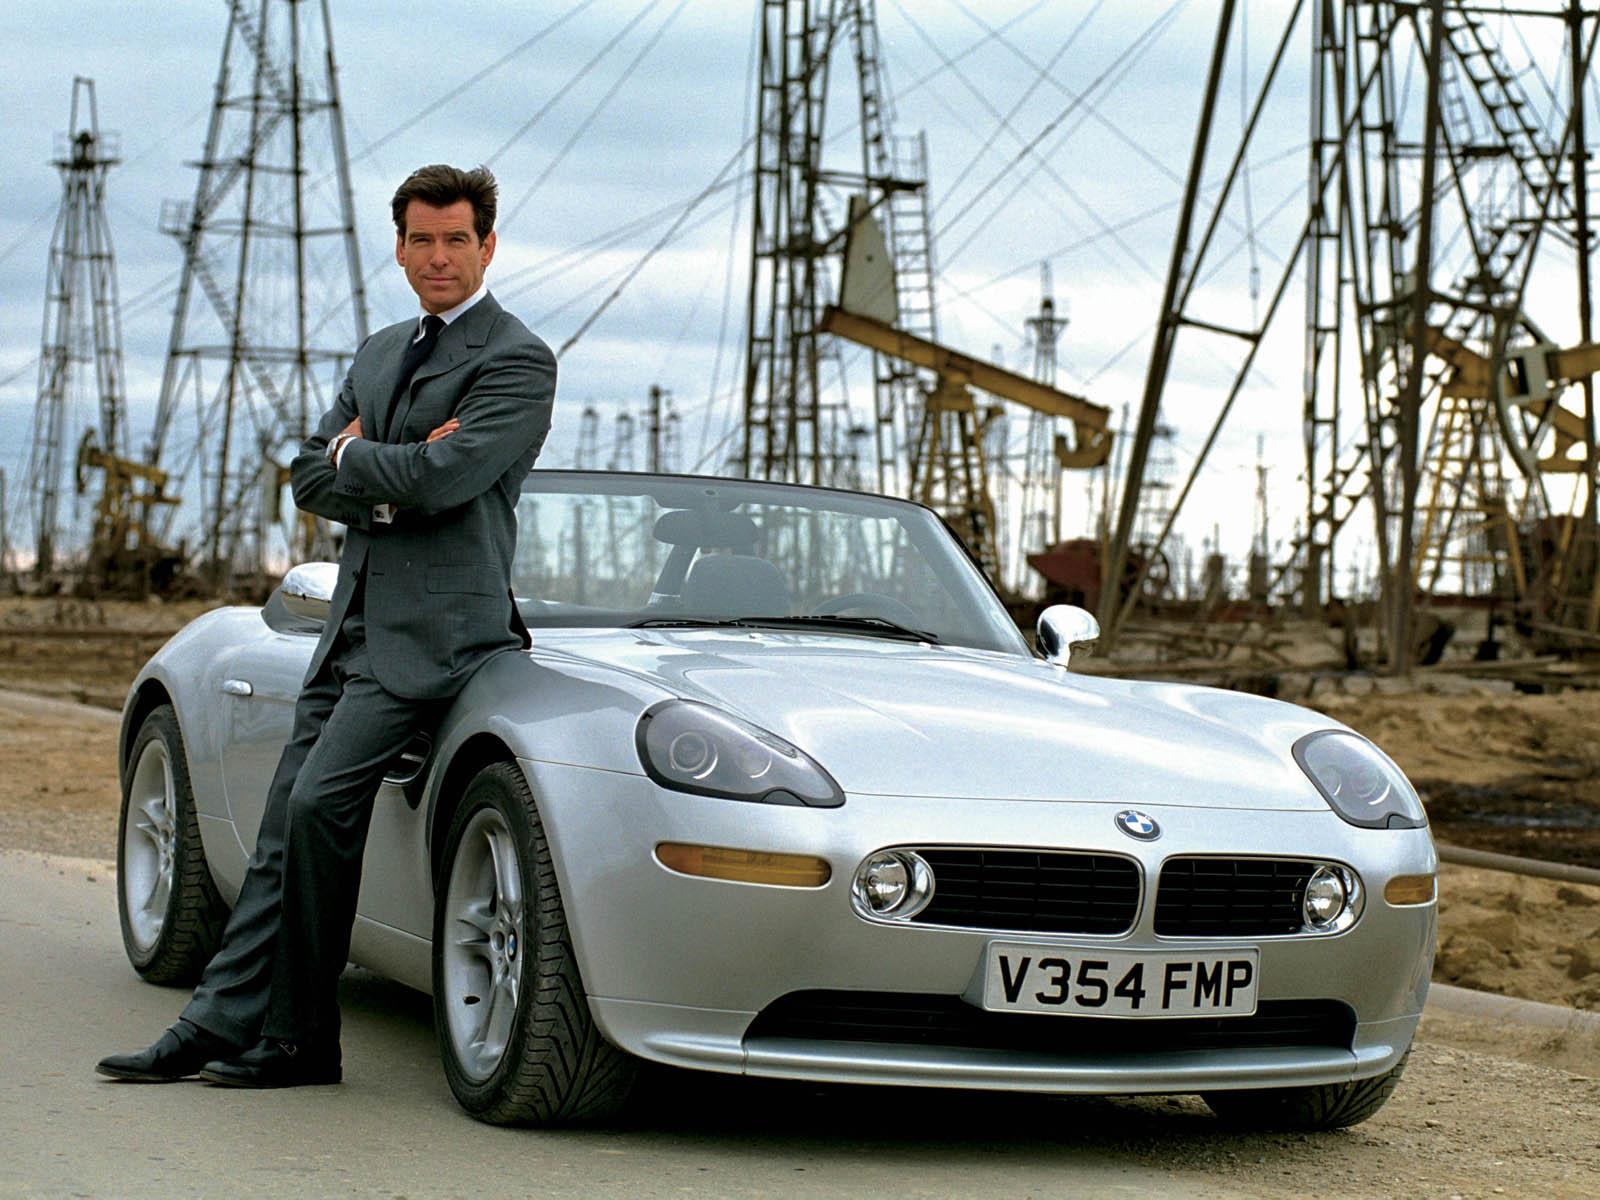 Definitely Motoring Aston Martin Db7 The James Bond Car That Wasn T